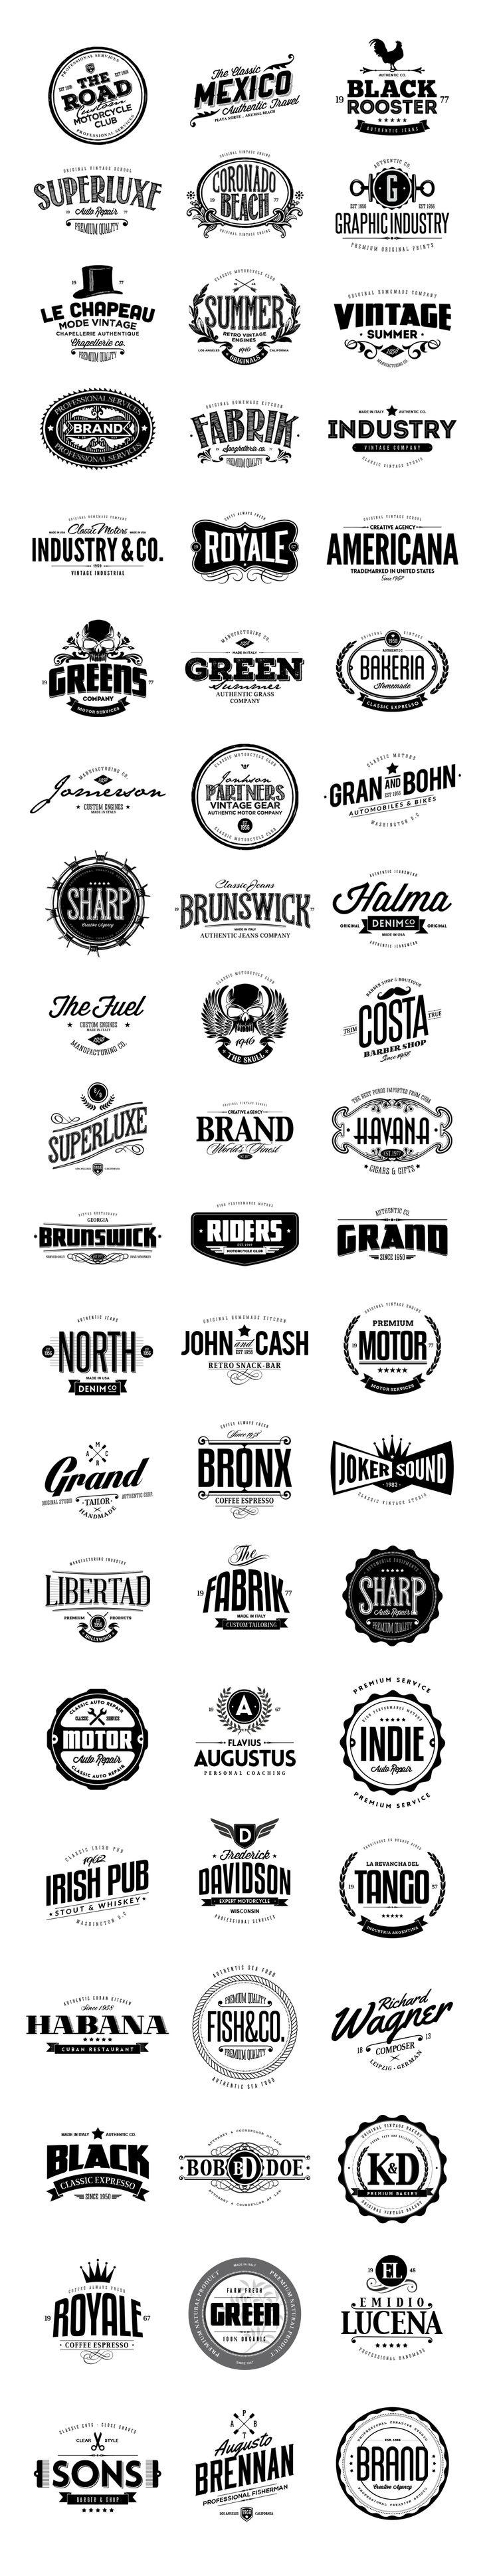 60 Badges & Logos Bundle on Behance